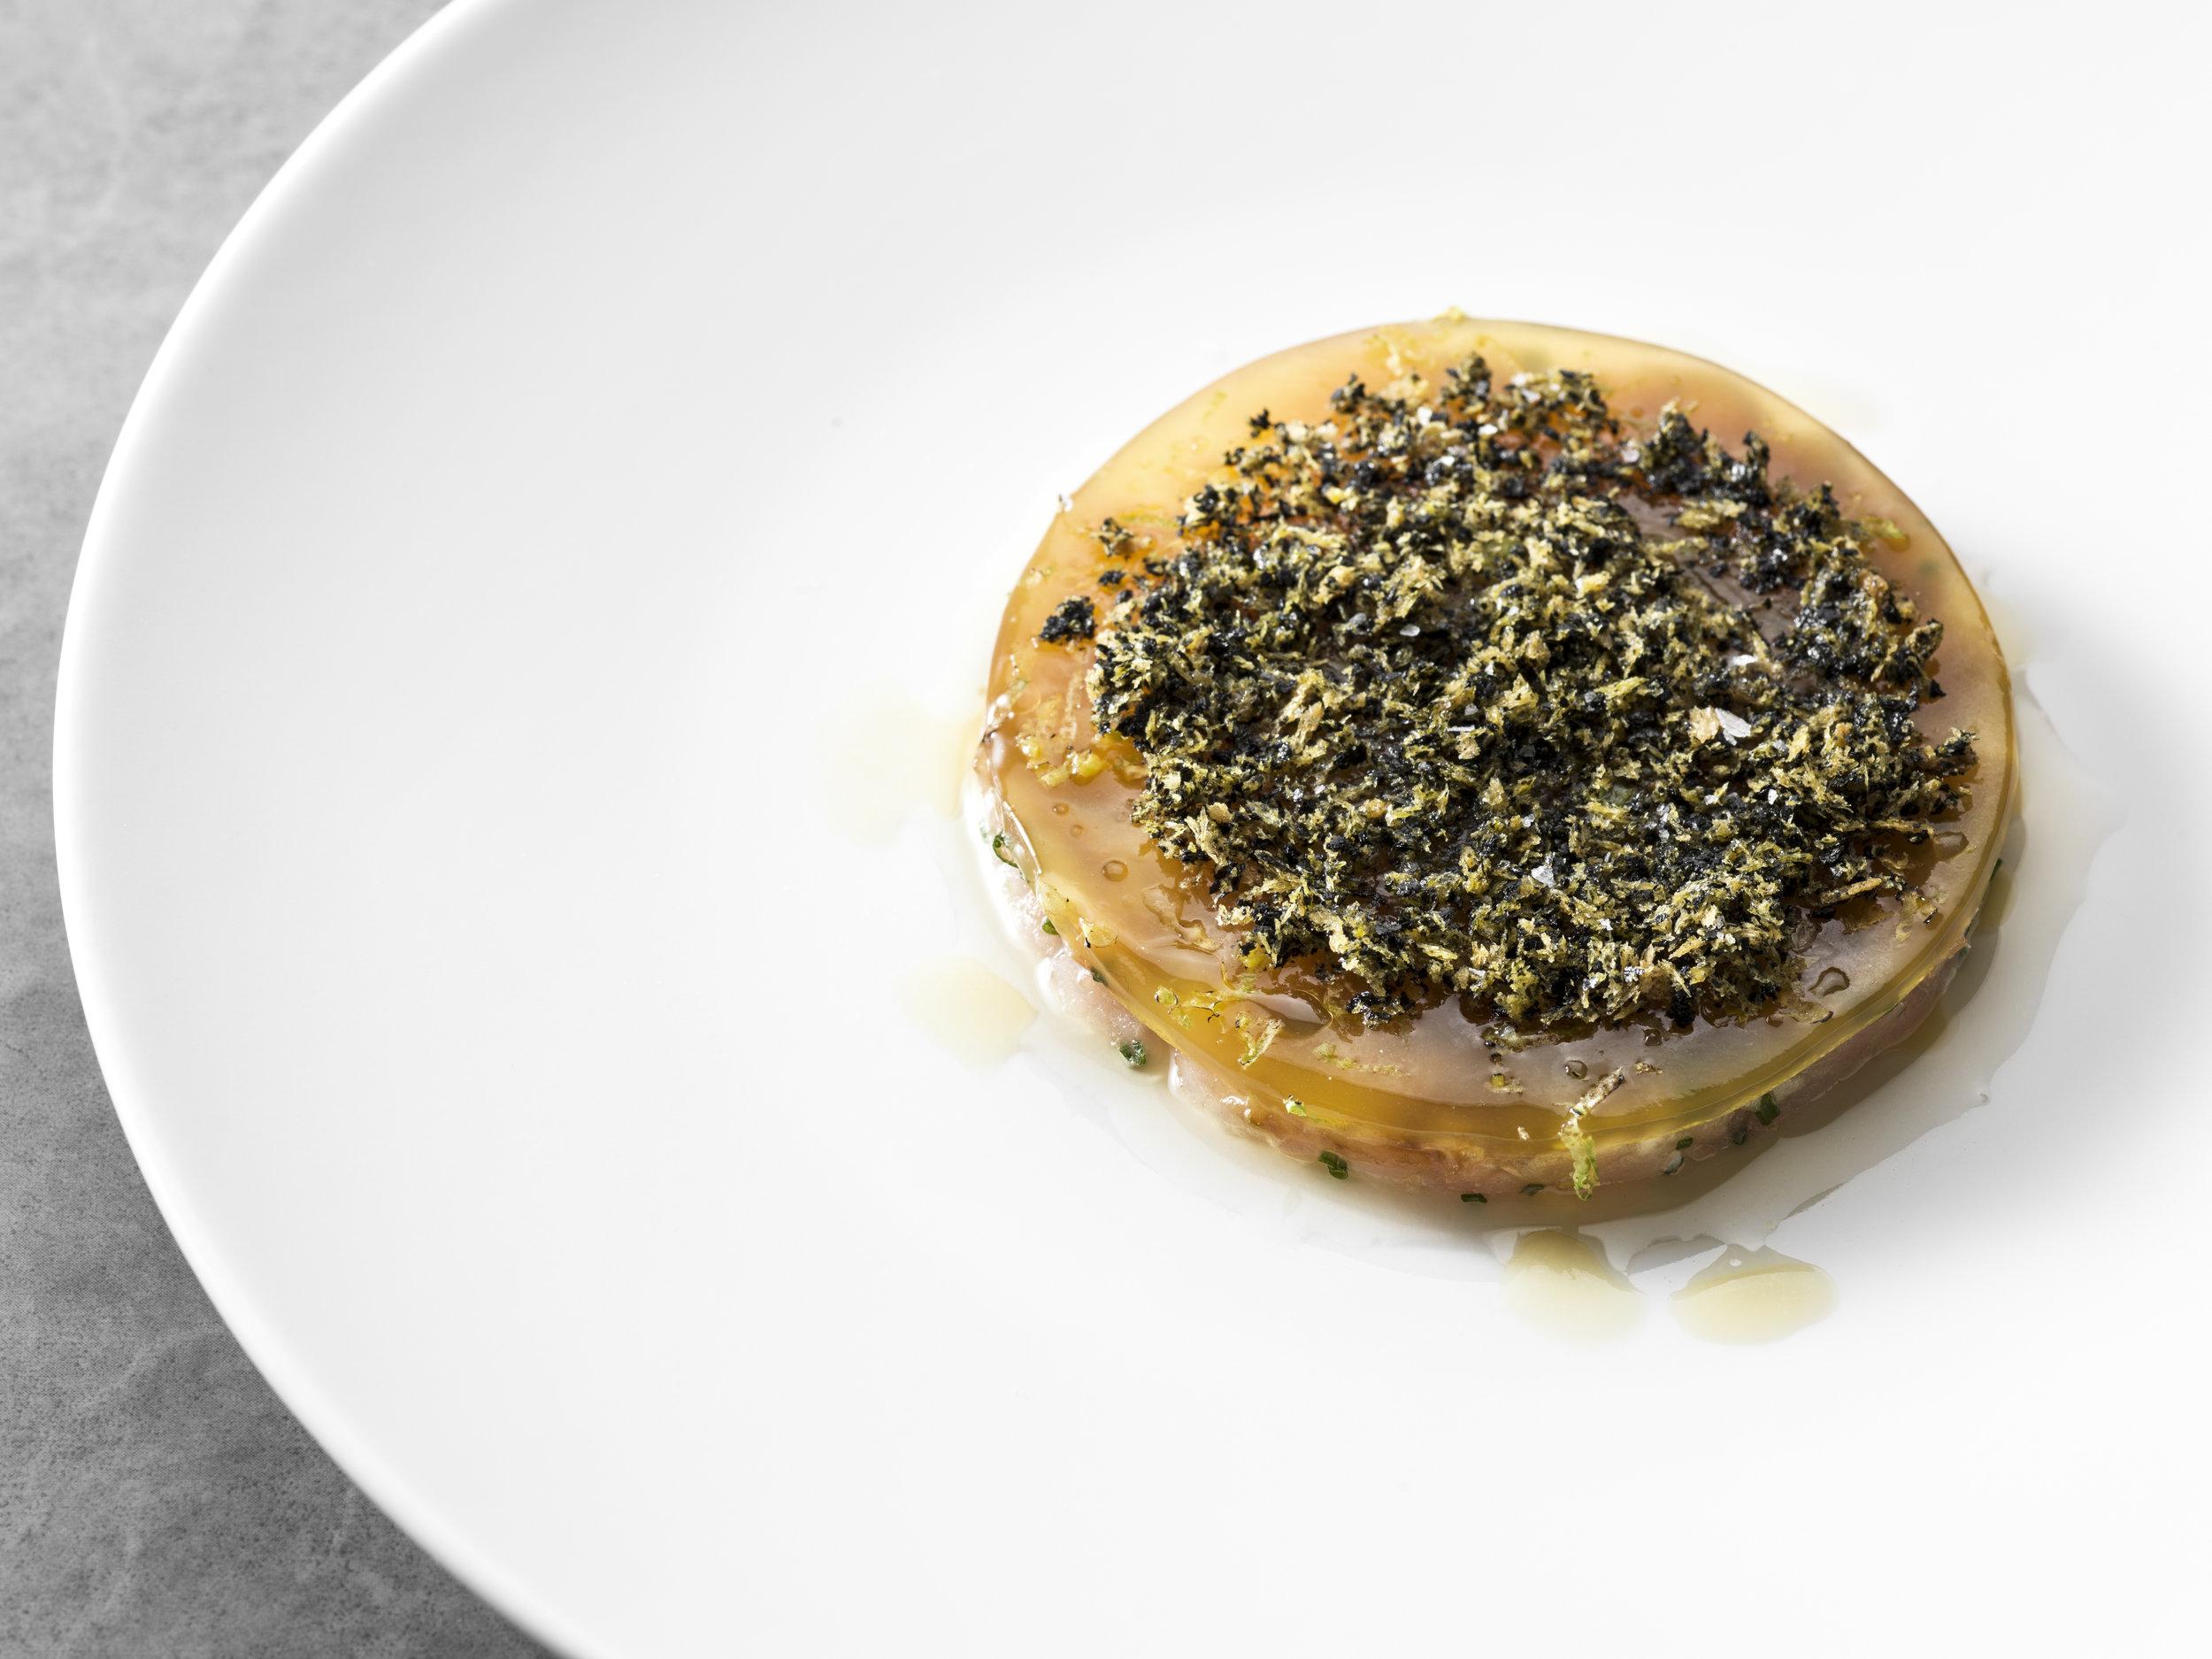 Jan Sobecki | Albecore tonijn, passievrucht, nori en koriander.